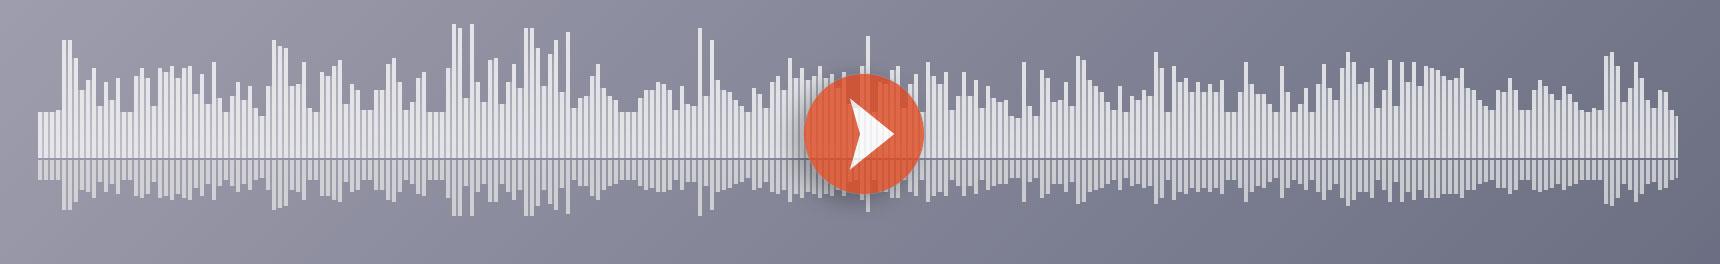 Audio Graphic - Play